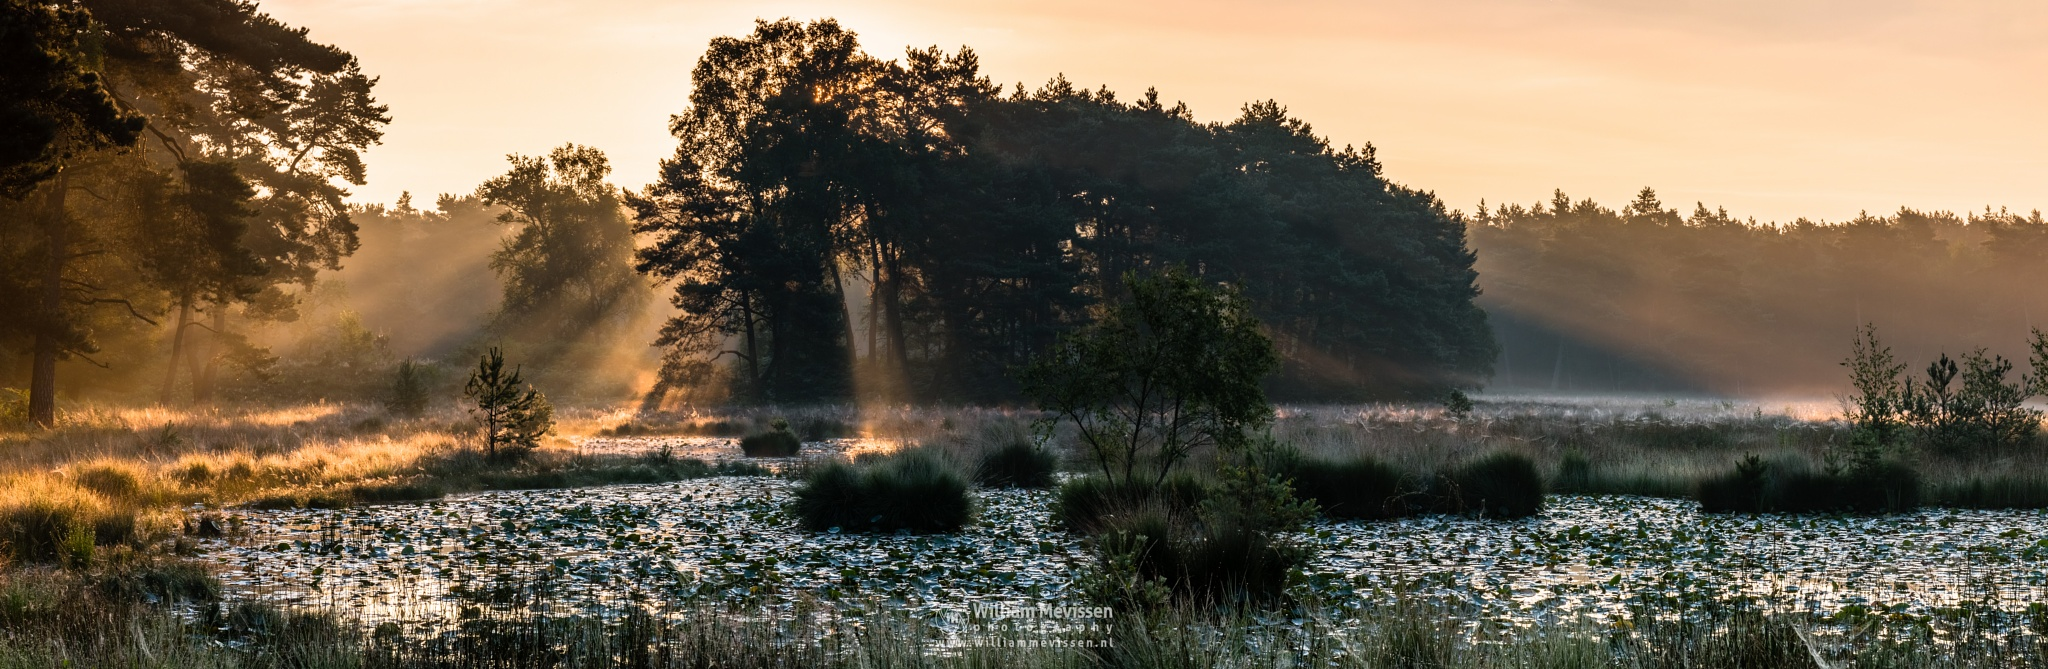 Photo in Landscape #ravenvennen #lomm #limburg #noord-limburg #arcen #nature #nature reserve #forest #woods #velden #netherlands #swamp #fen #sunrise #mood #silhouette #silhouettes #trees #tree #fens #sunrays #rays #beams